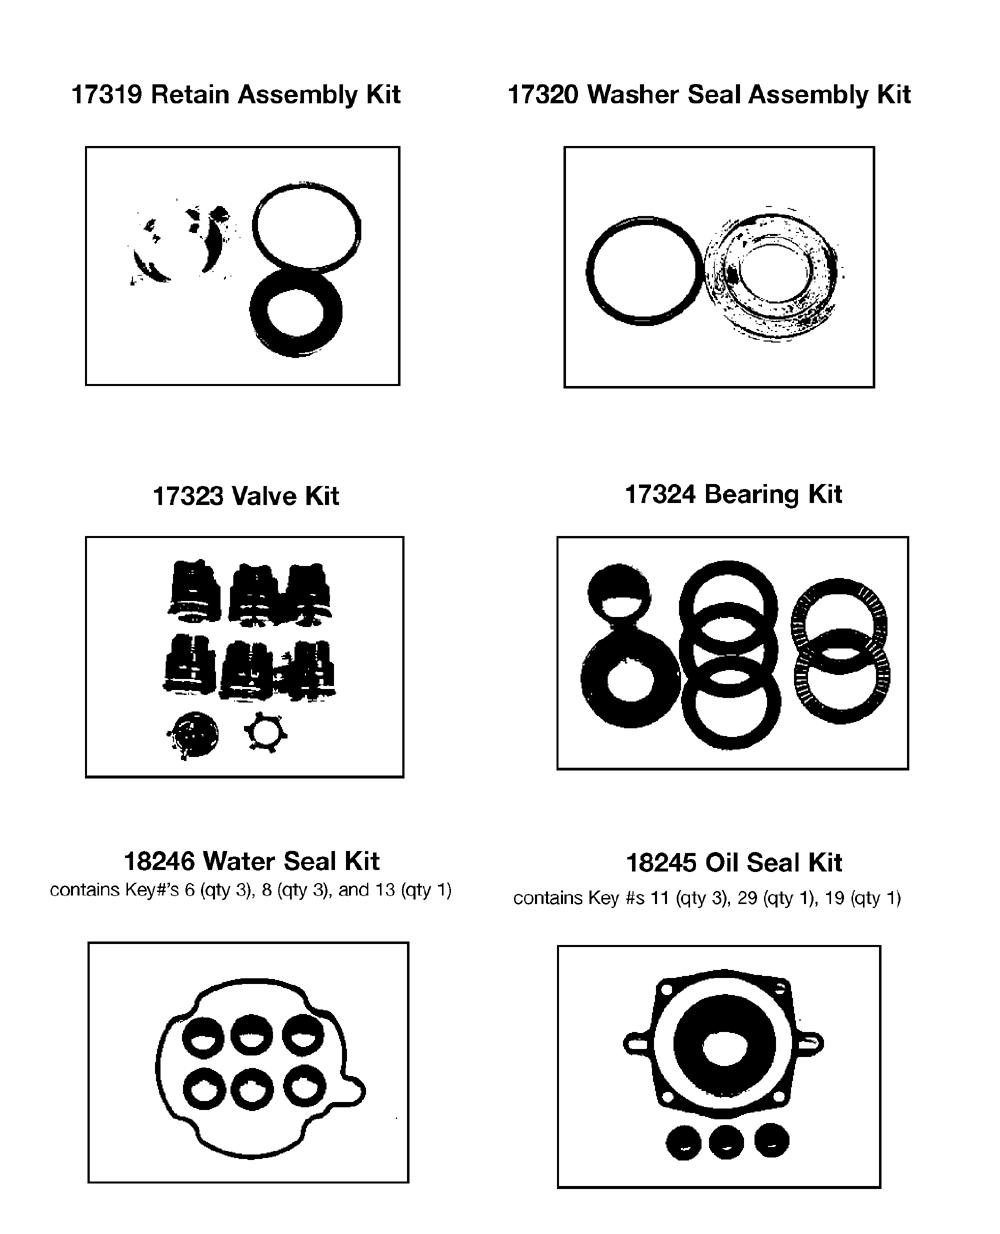 MH5500H-Devilbiss-T1-PB-1Break Down